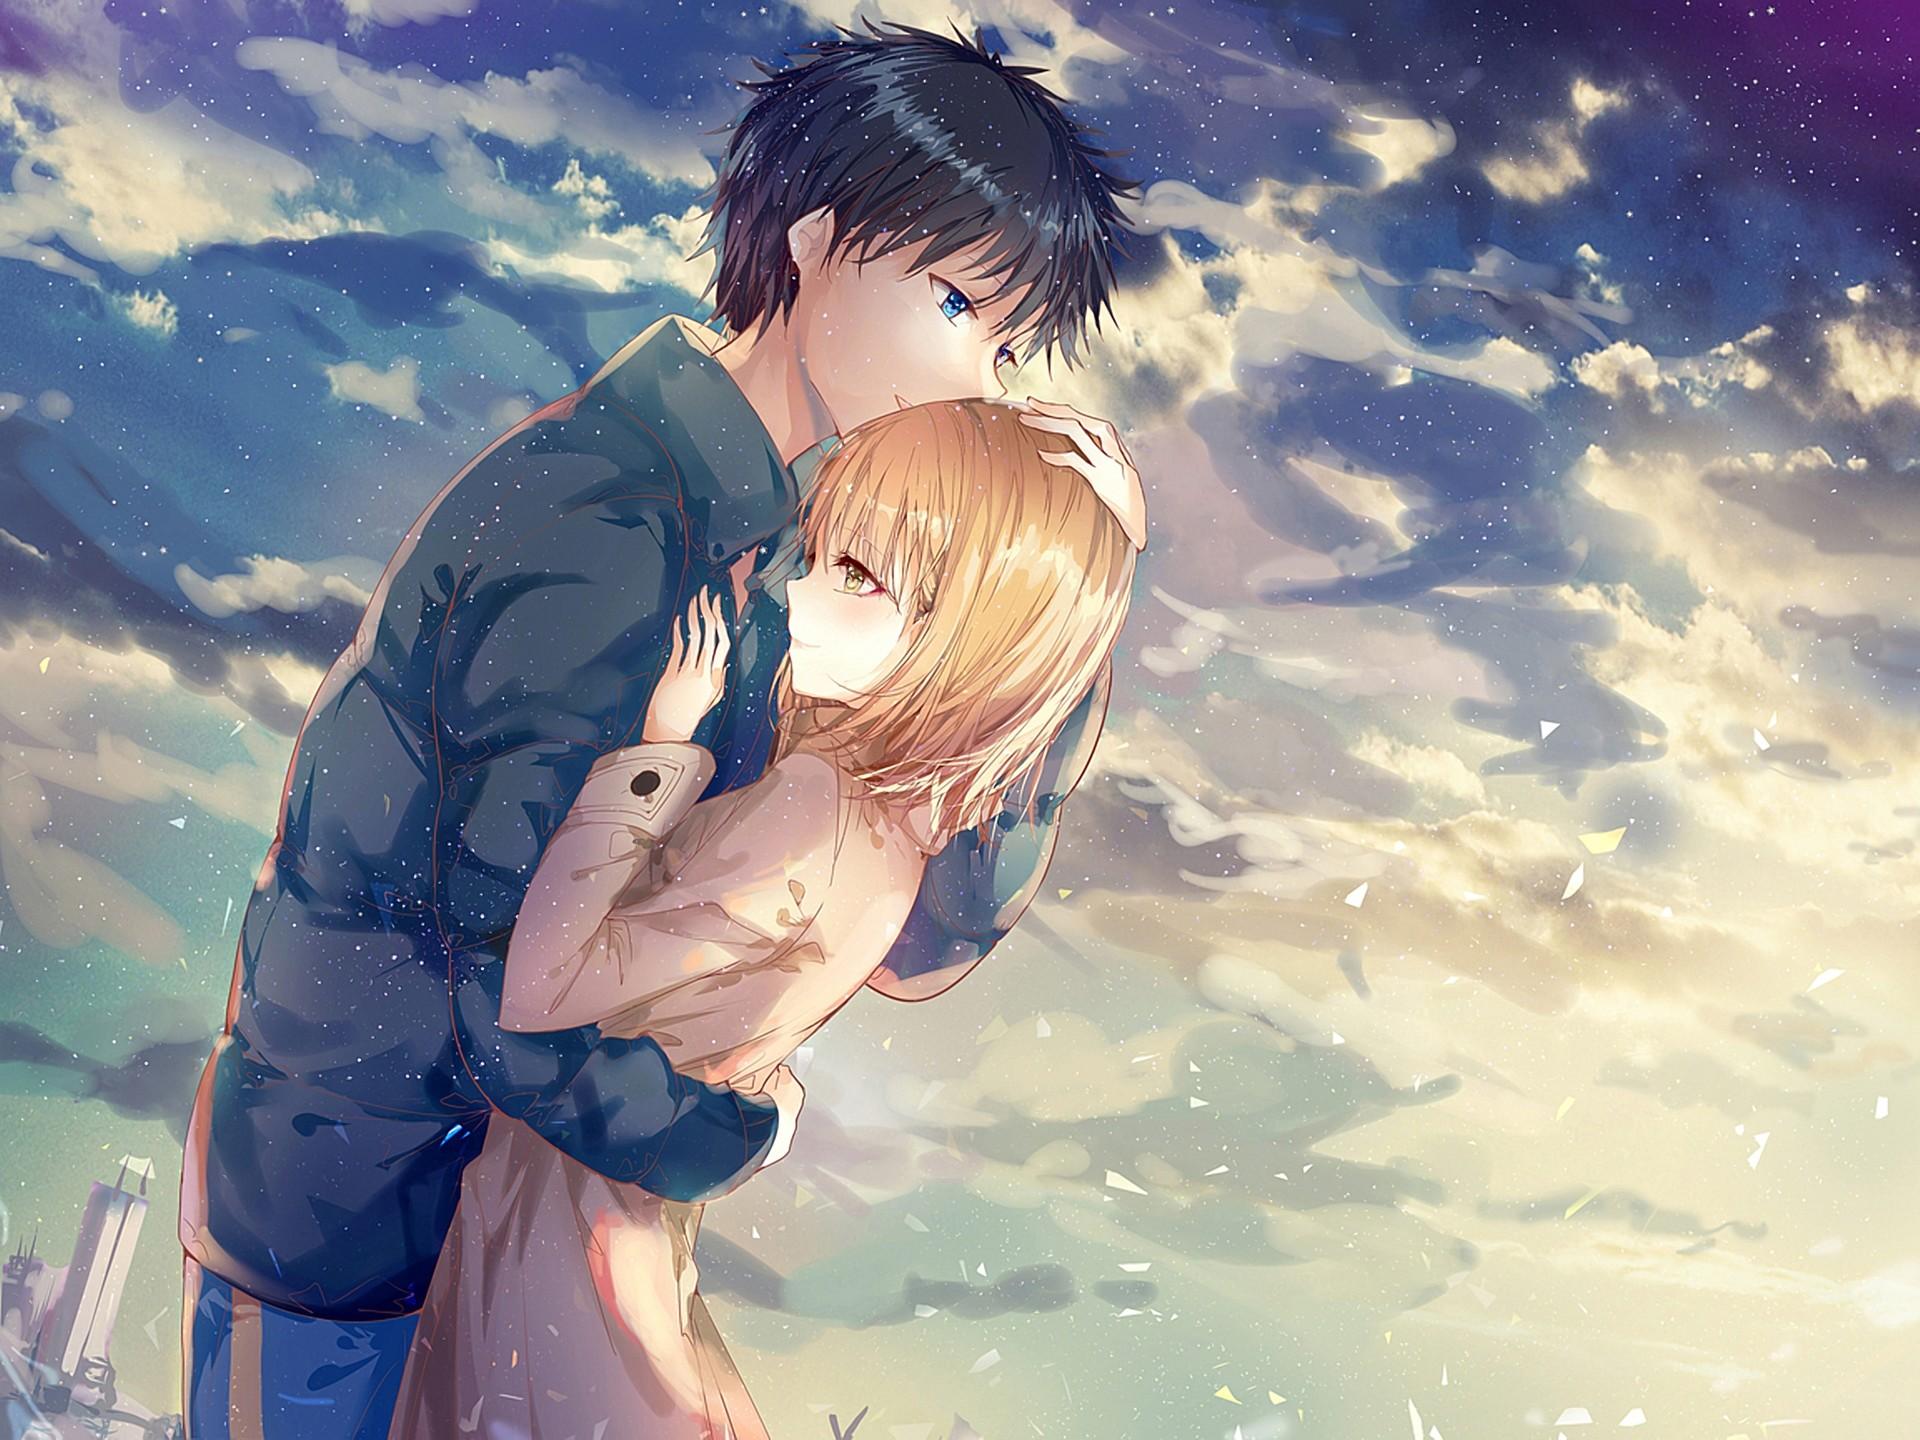 Res: 1920x1440, Anime Couple, Hug, Romance, Clouds, Scenic